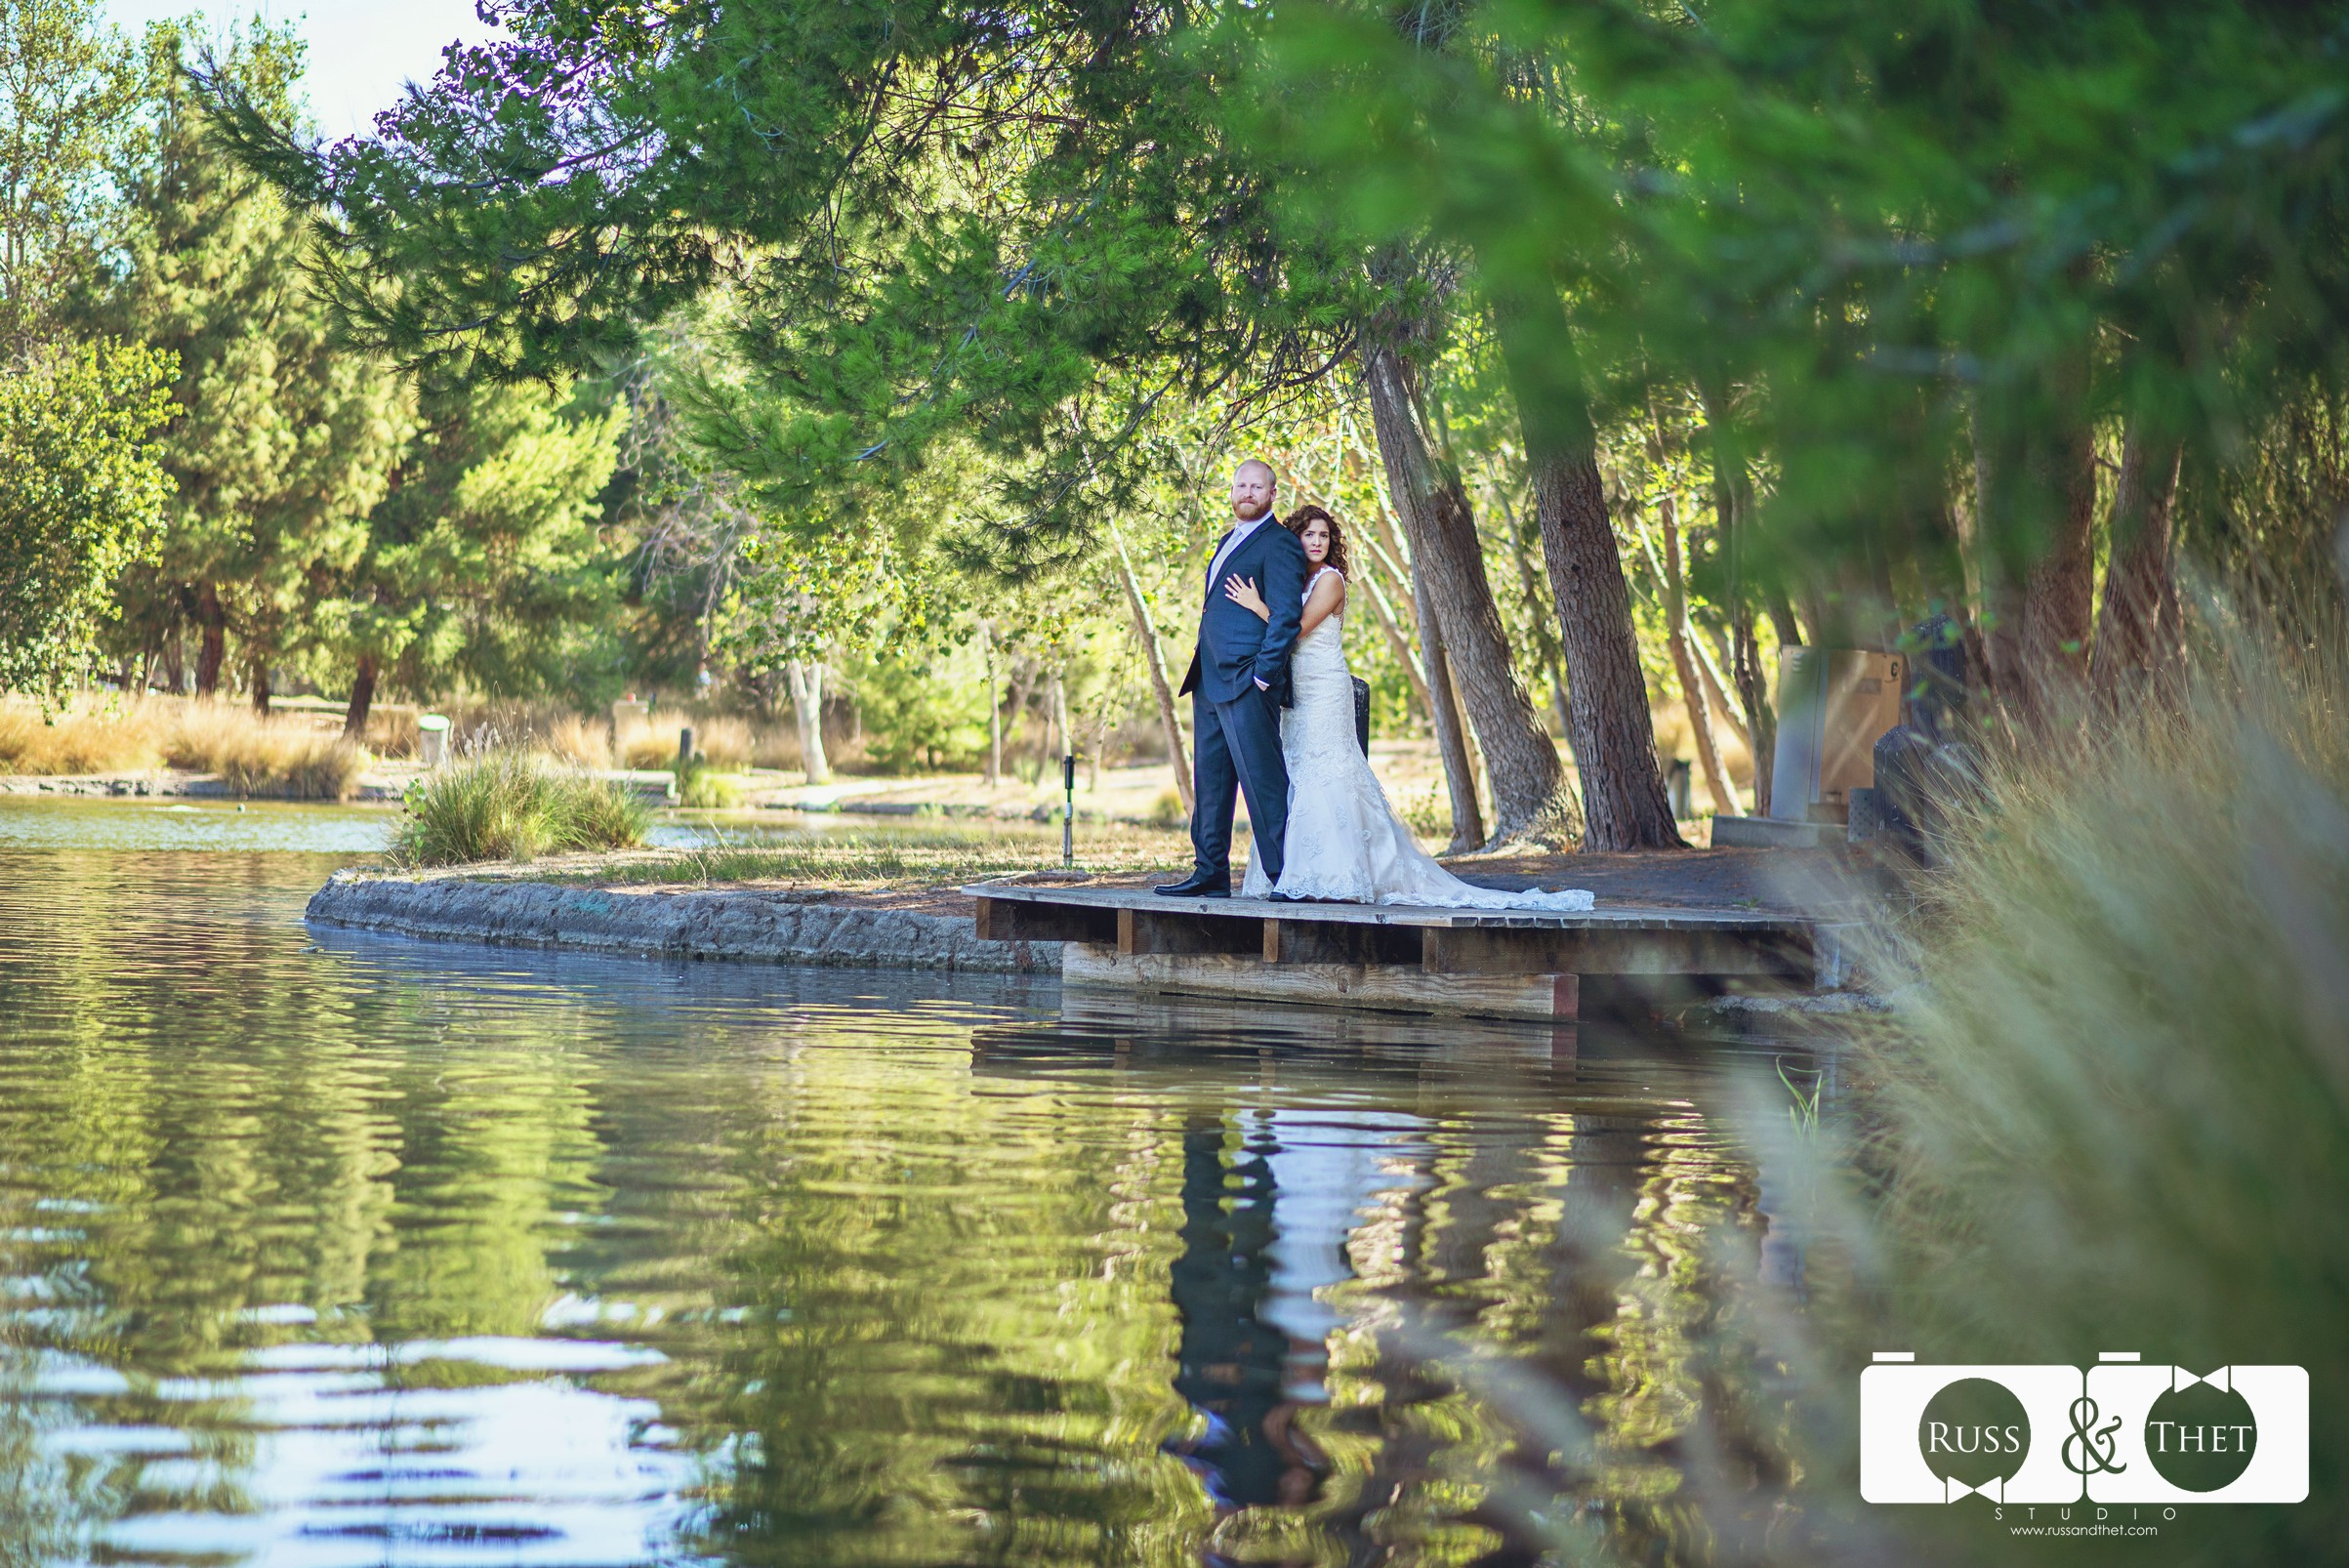 Andrew-and-Cristina-Yorba-Park-Wedding-Photographers (1).jpg